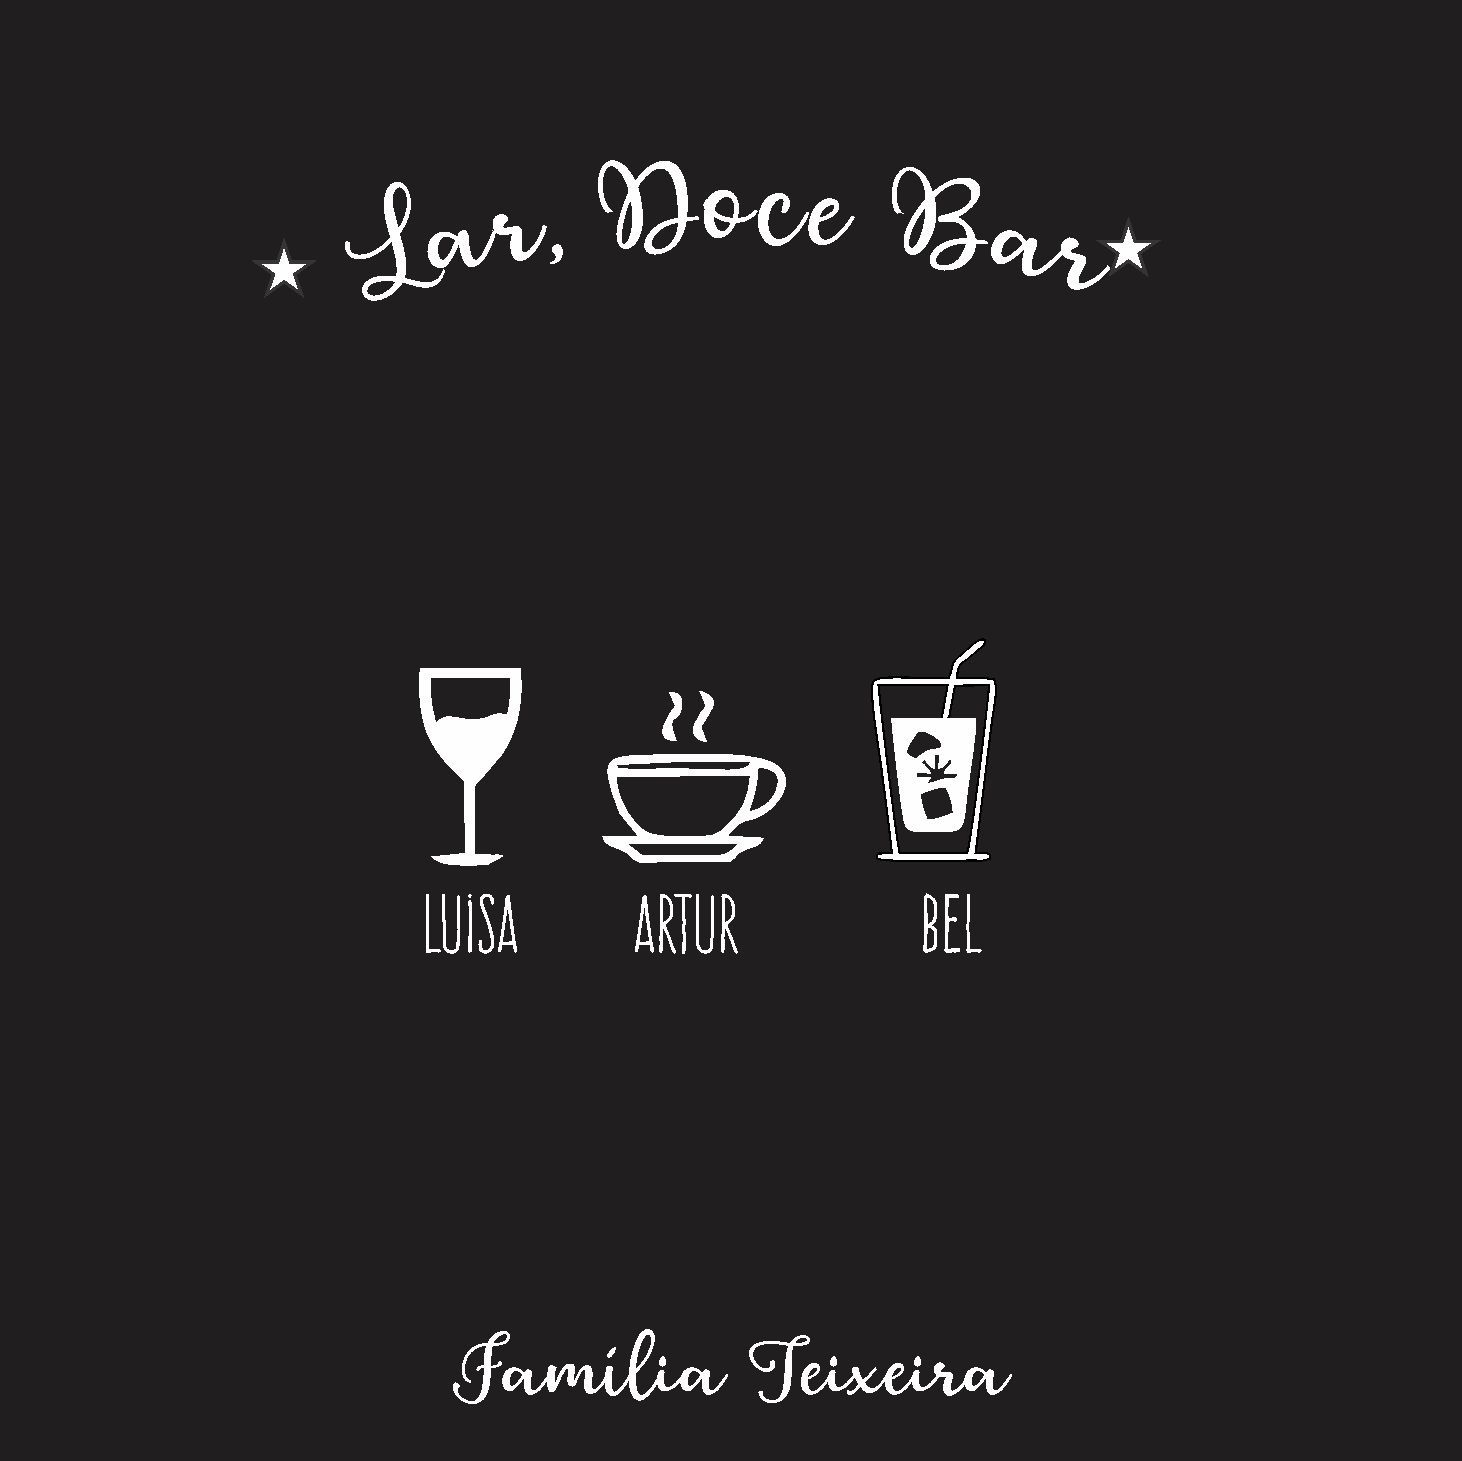 Quadro Personalizado - Lar Doce Bar